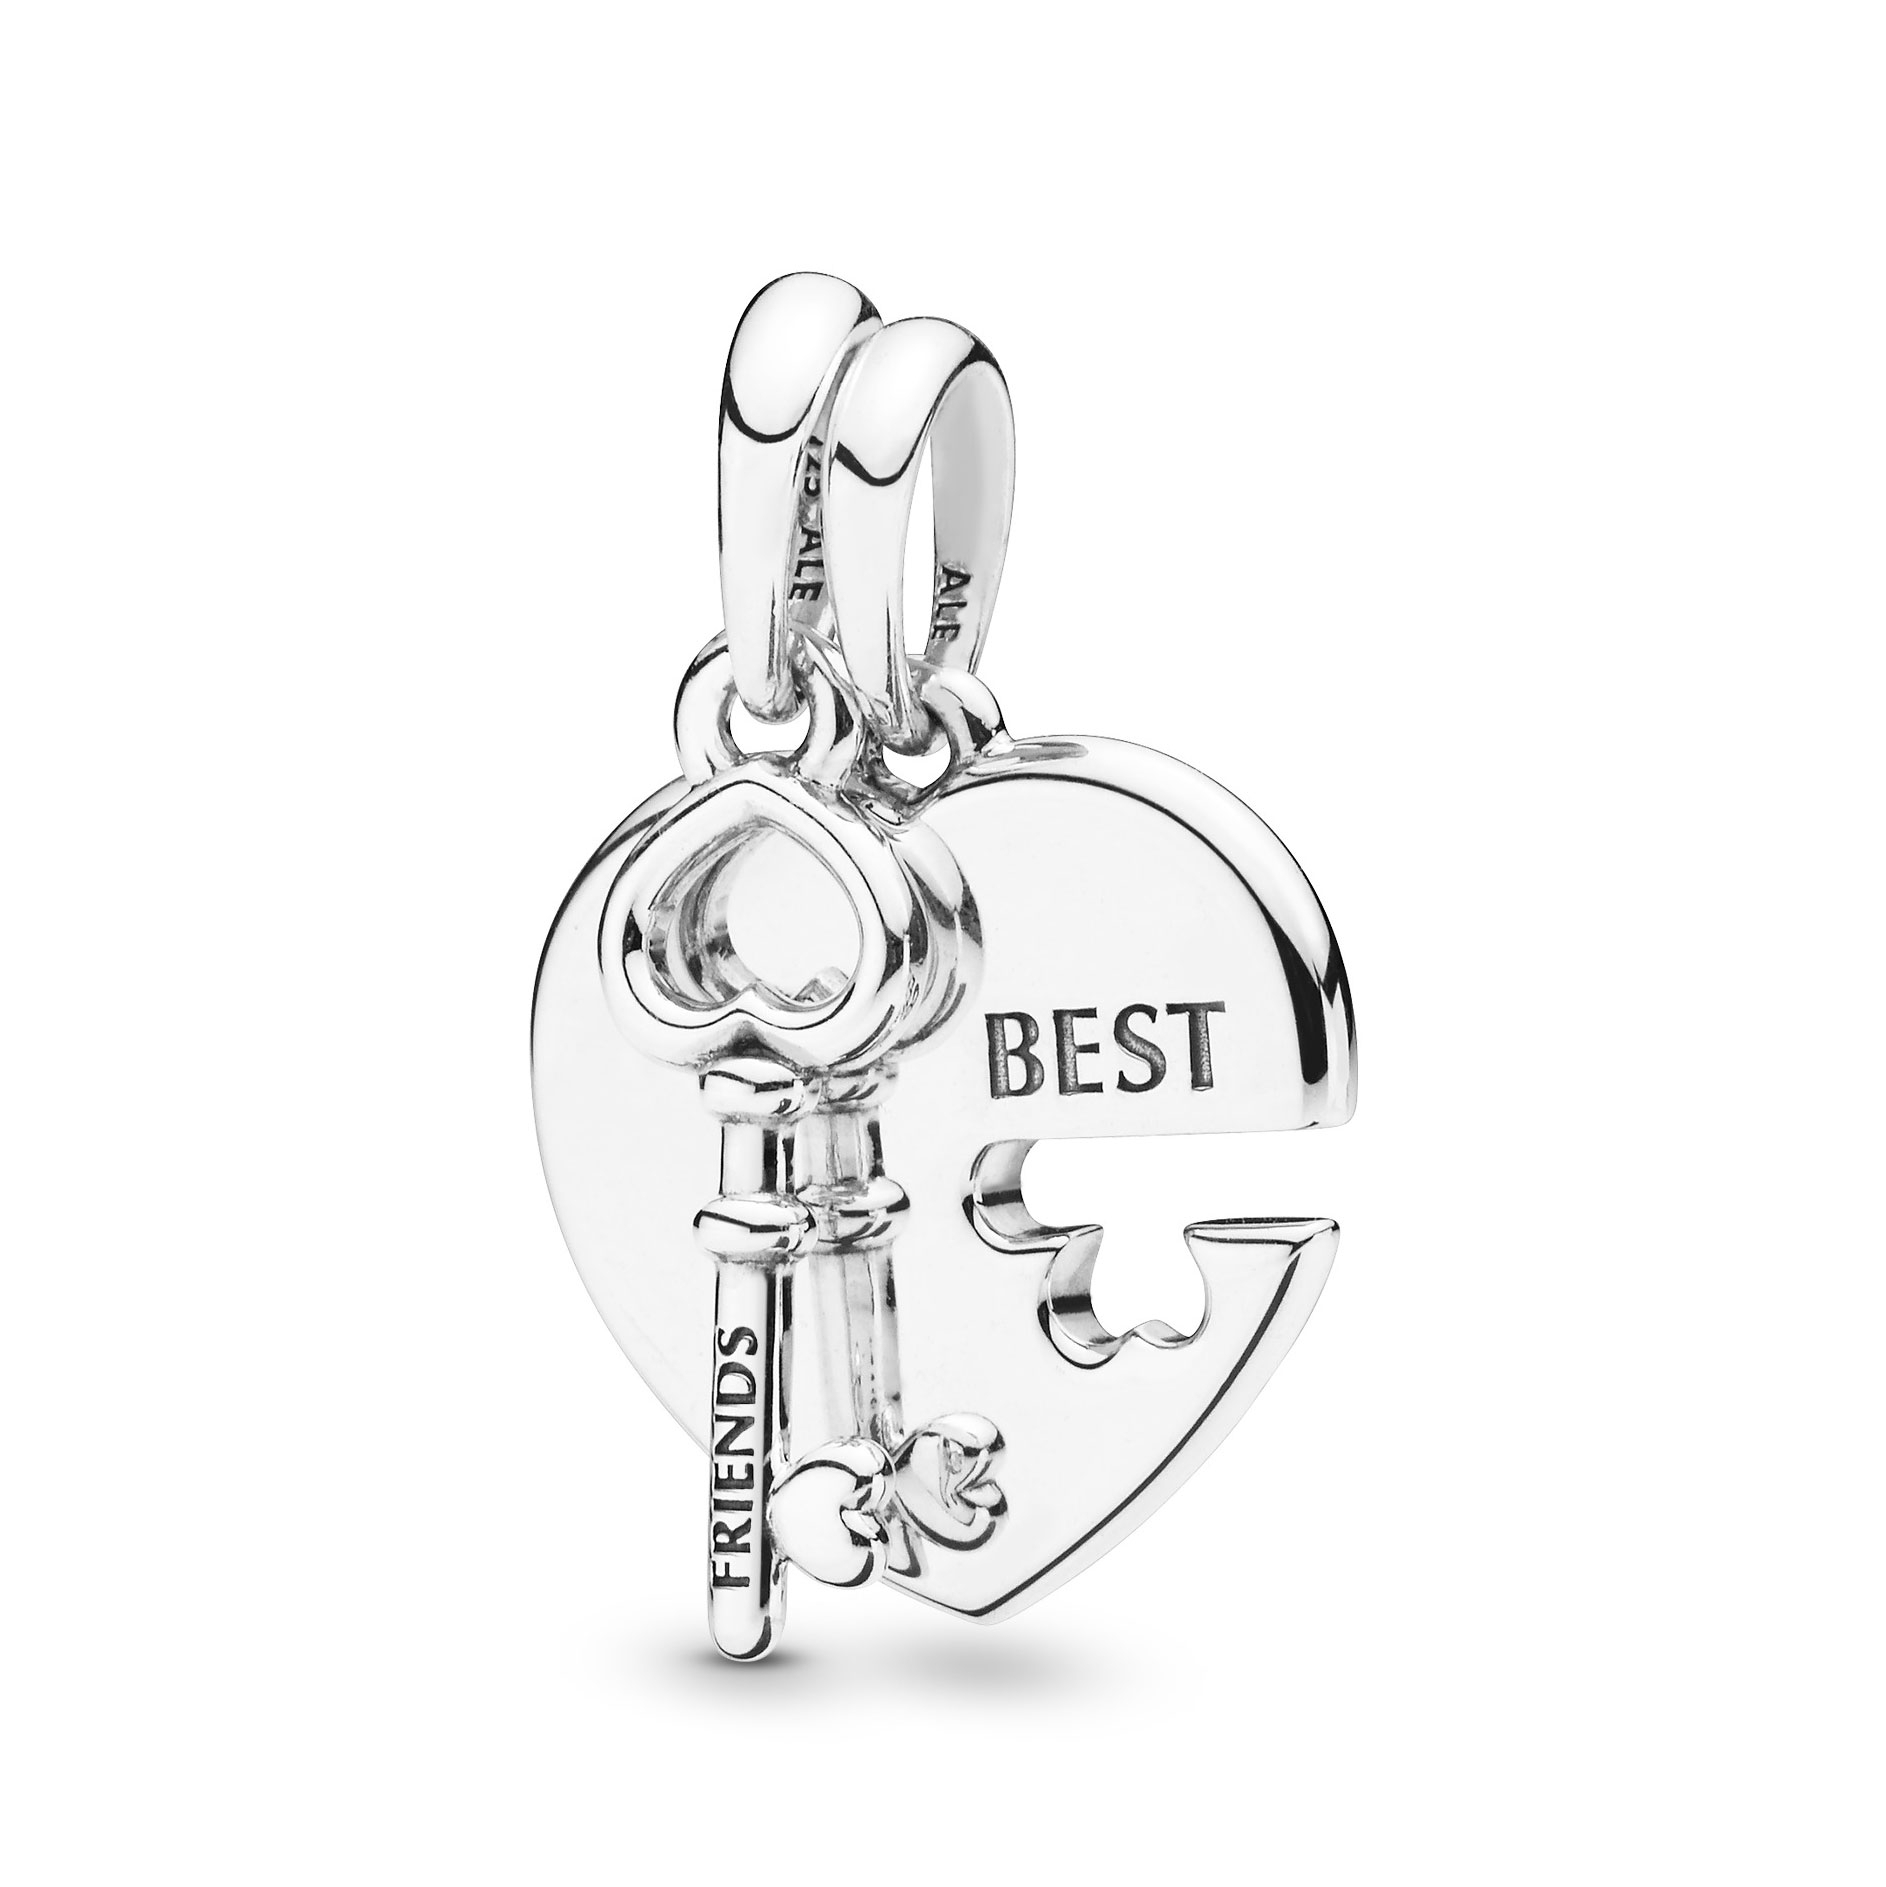 Pandora Best Friends Heart & Key Necklace Pendant – 398130 | Ben Intended For Most Popular Best Friends Heart & Key Necklaces Pendant Necklaces (View 8 of 25)